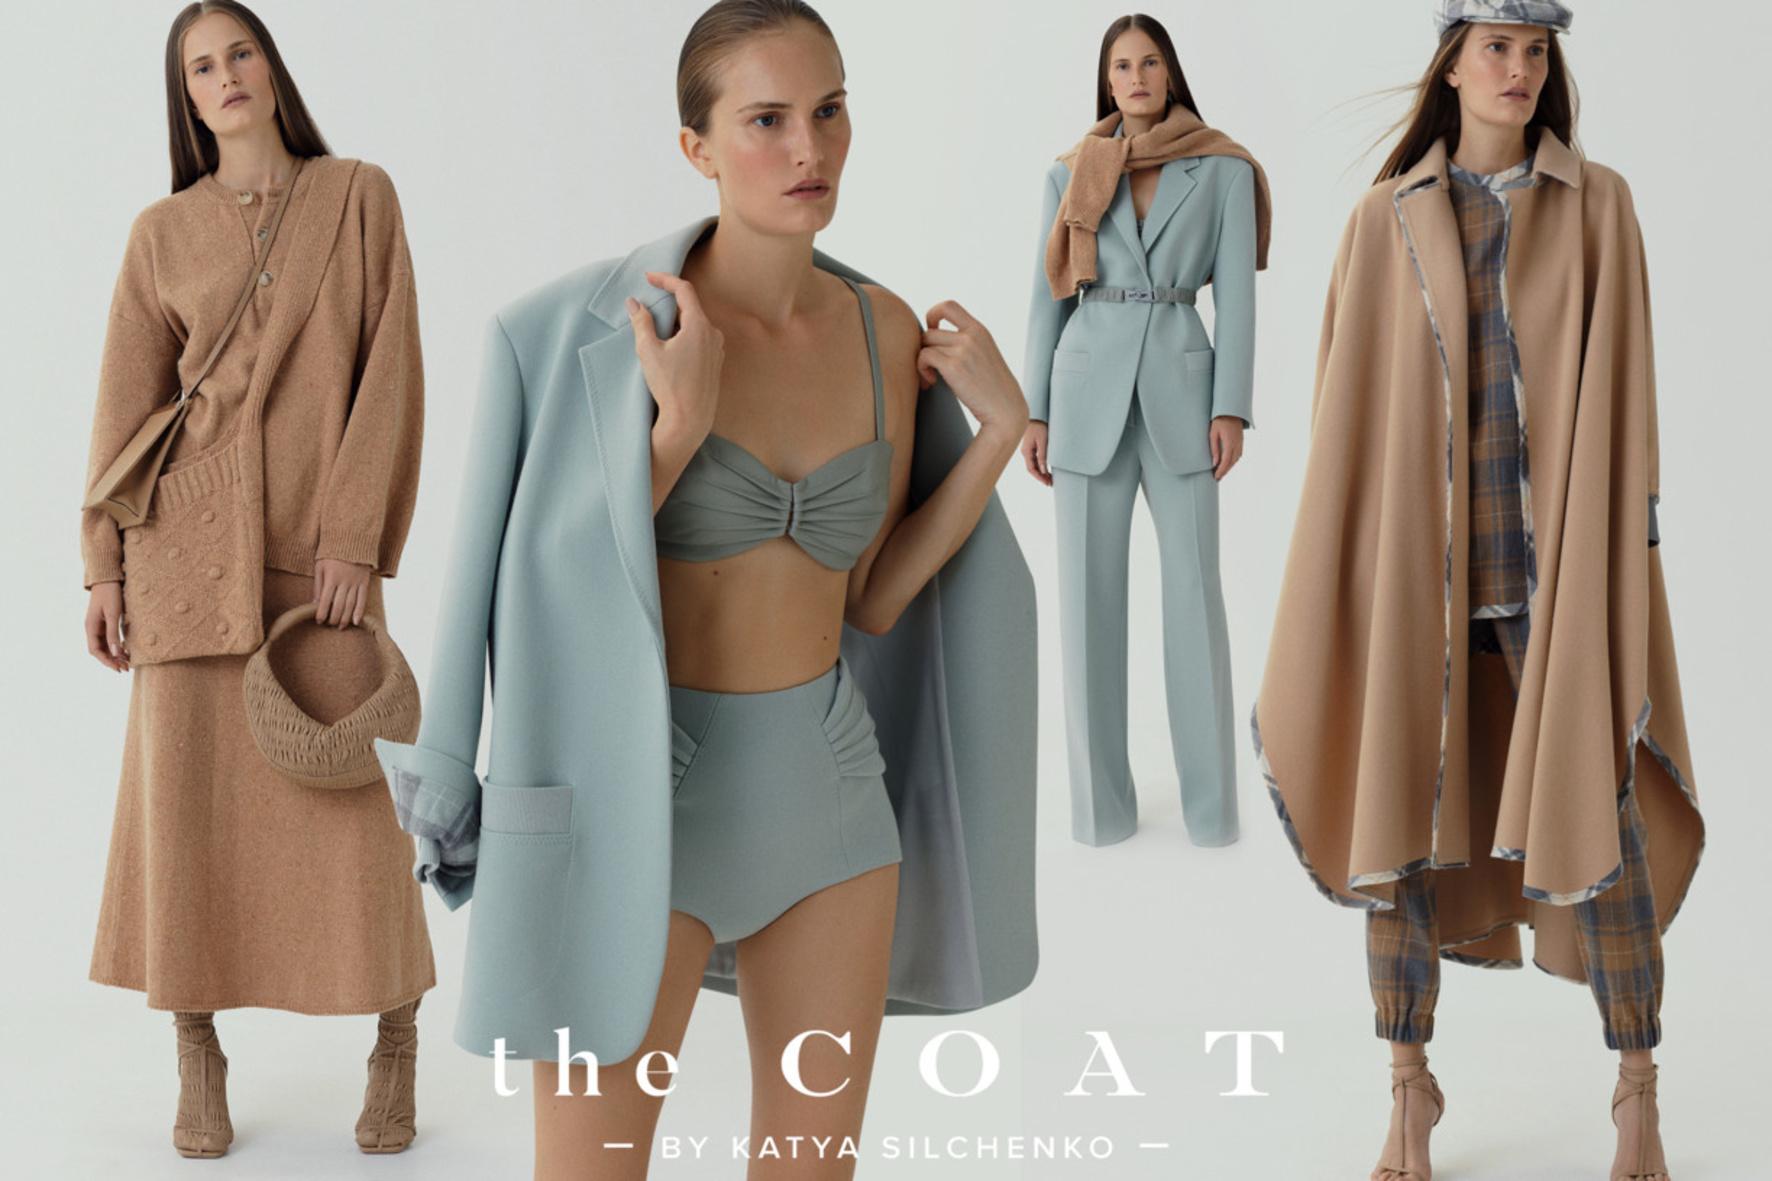 Колекція осінь-зима 2021/22' бренду the COAT by Katya Silchenko